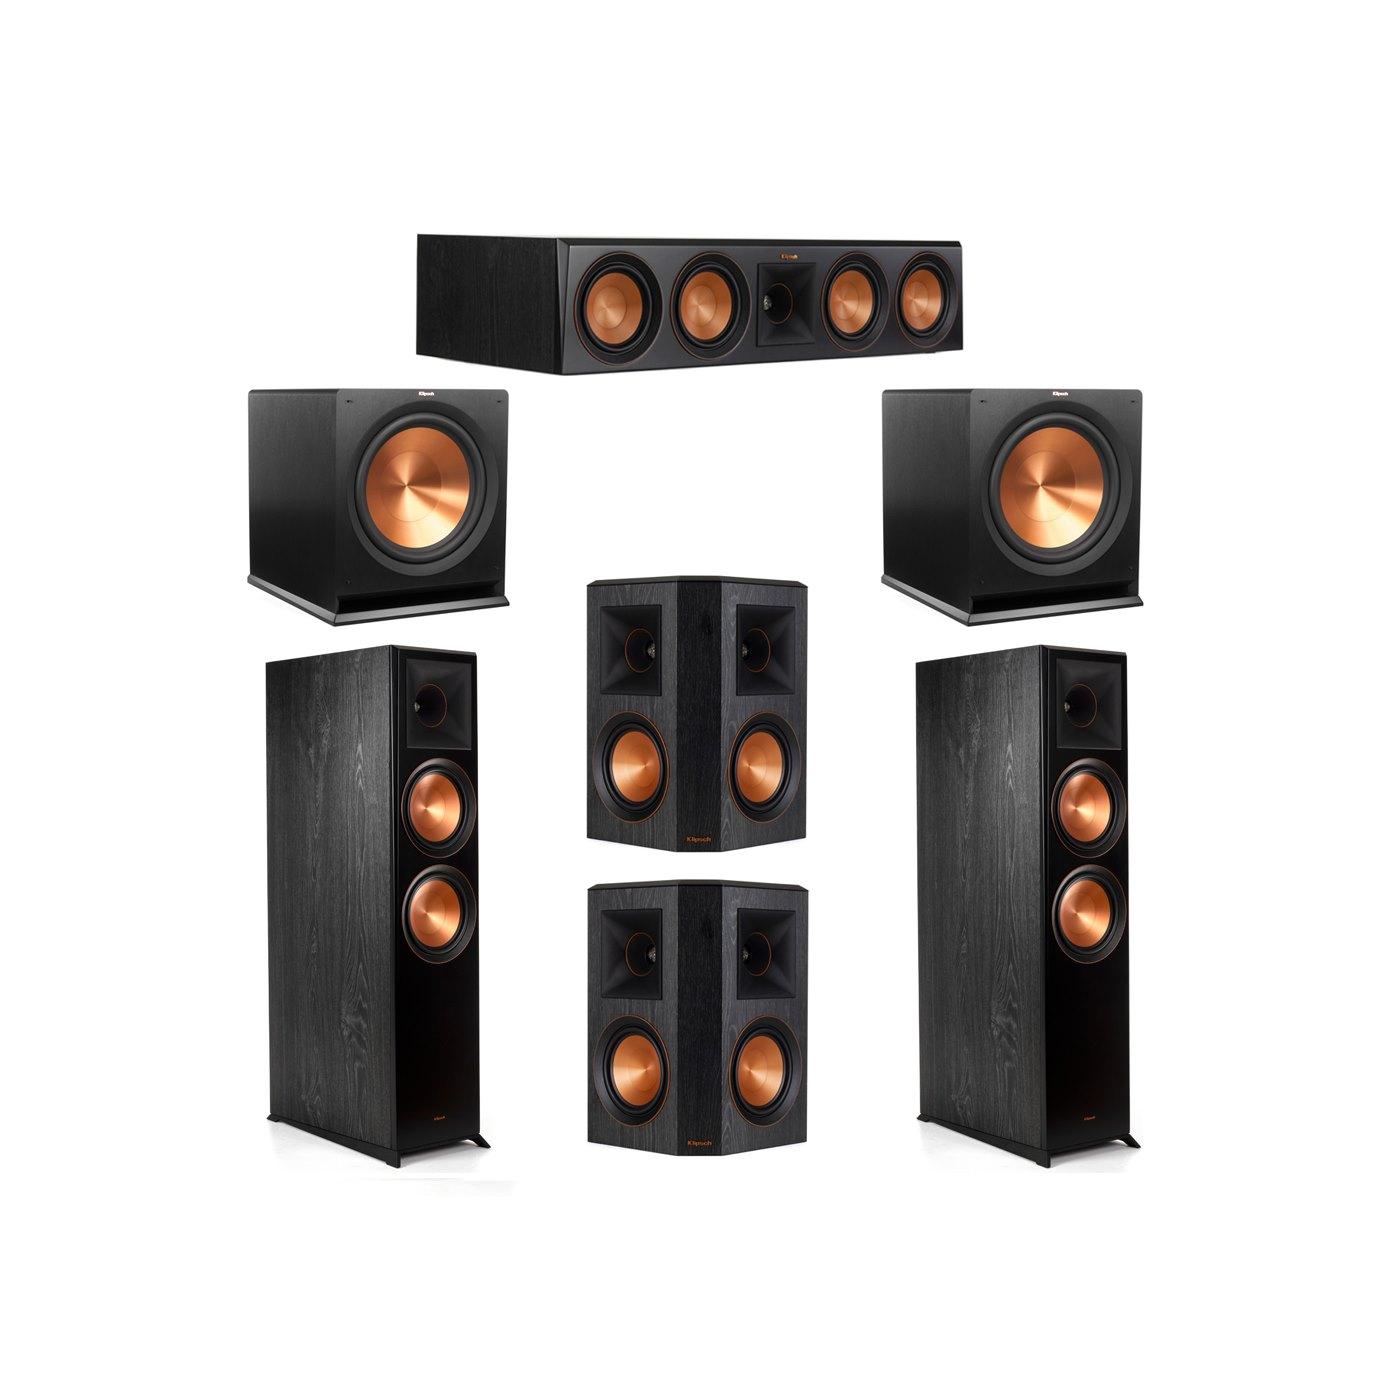 Klipsch 5.2 System with 2 RP-8000F Floorstanding Speakers, 1 Klipsch RP-504C Center Speaker, 2 Klipsch RP-502S Surround Speakers, 2 Klipsch R-115SW Subwoofers